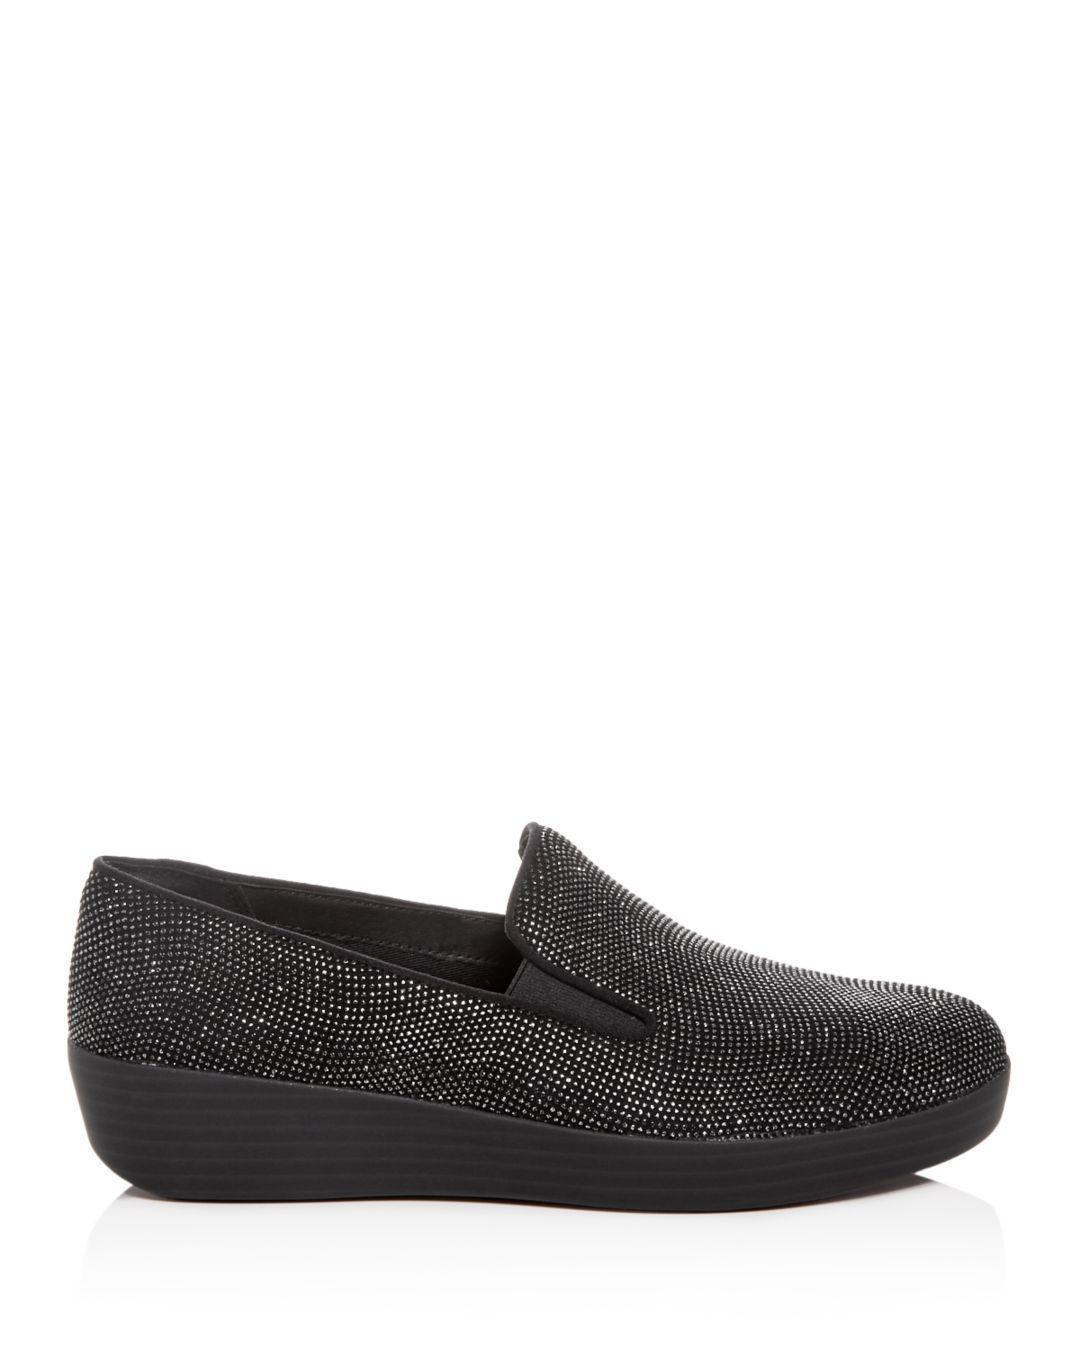 6ea97b68aea41b Lyst - Fitflop Women s Superskate Embellished Loafers in Black